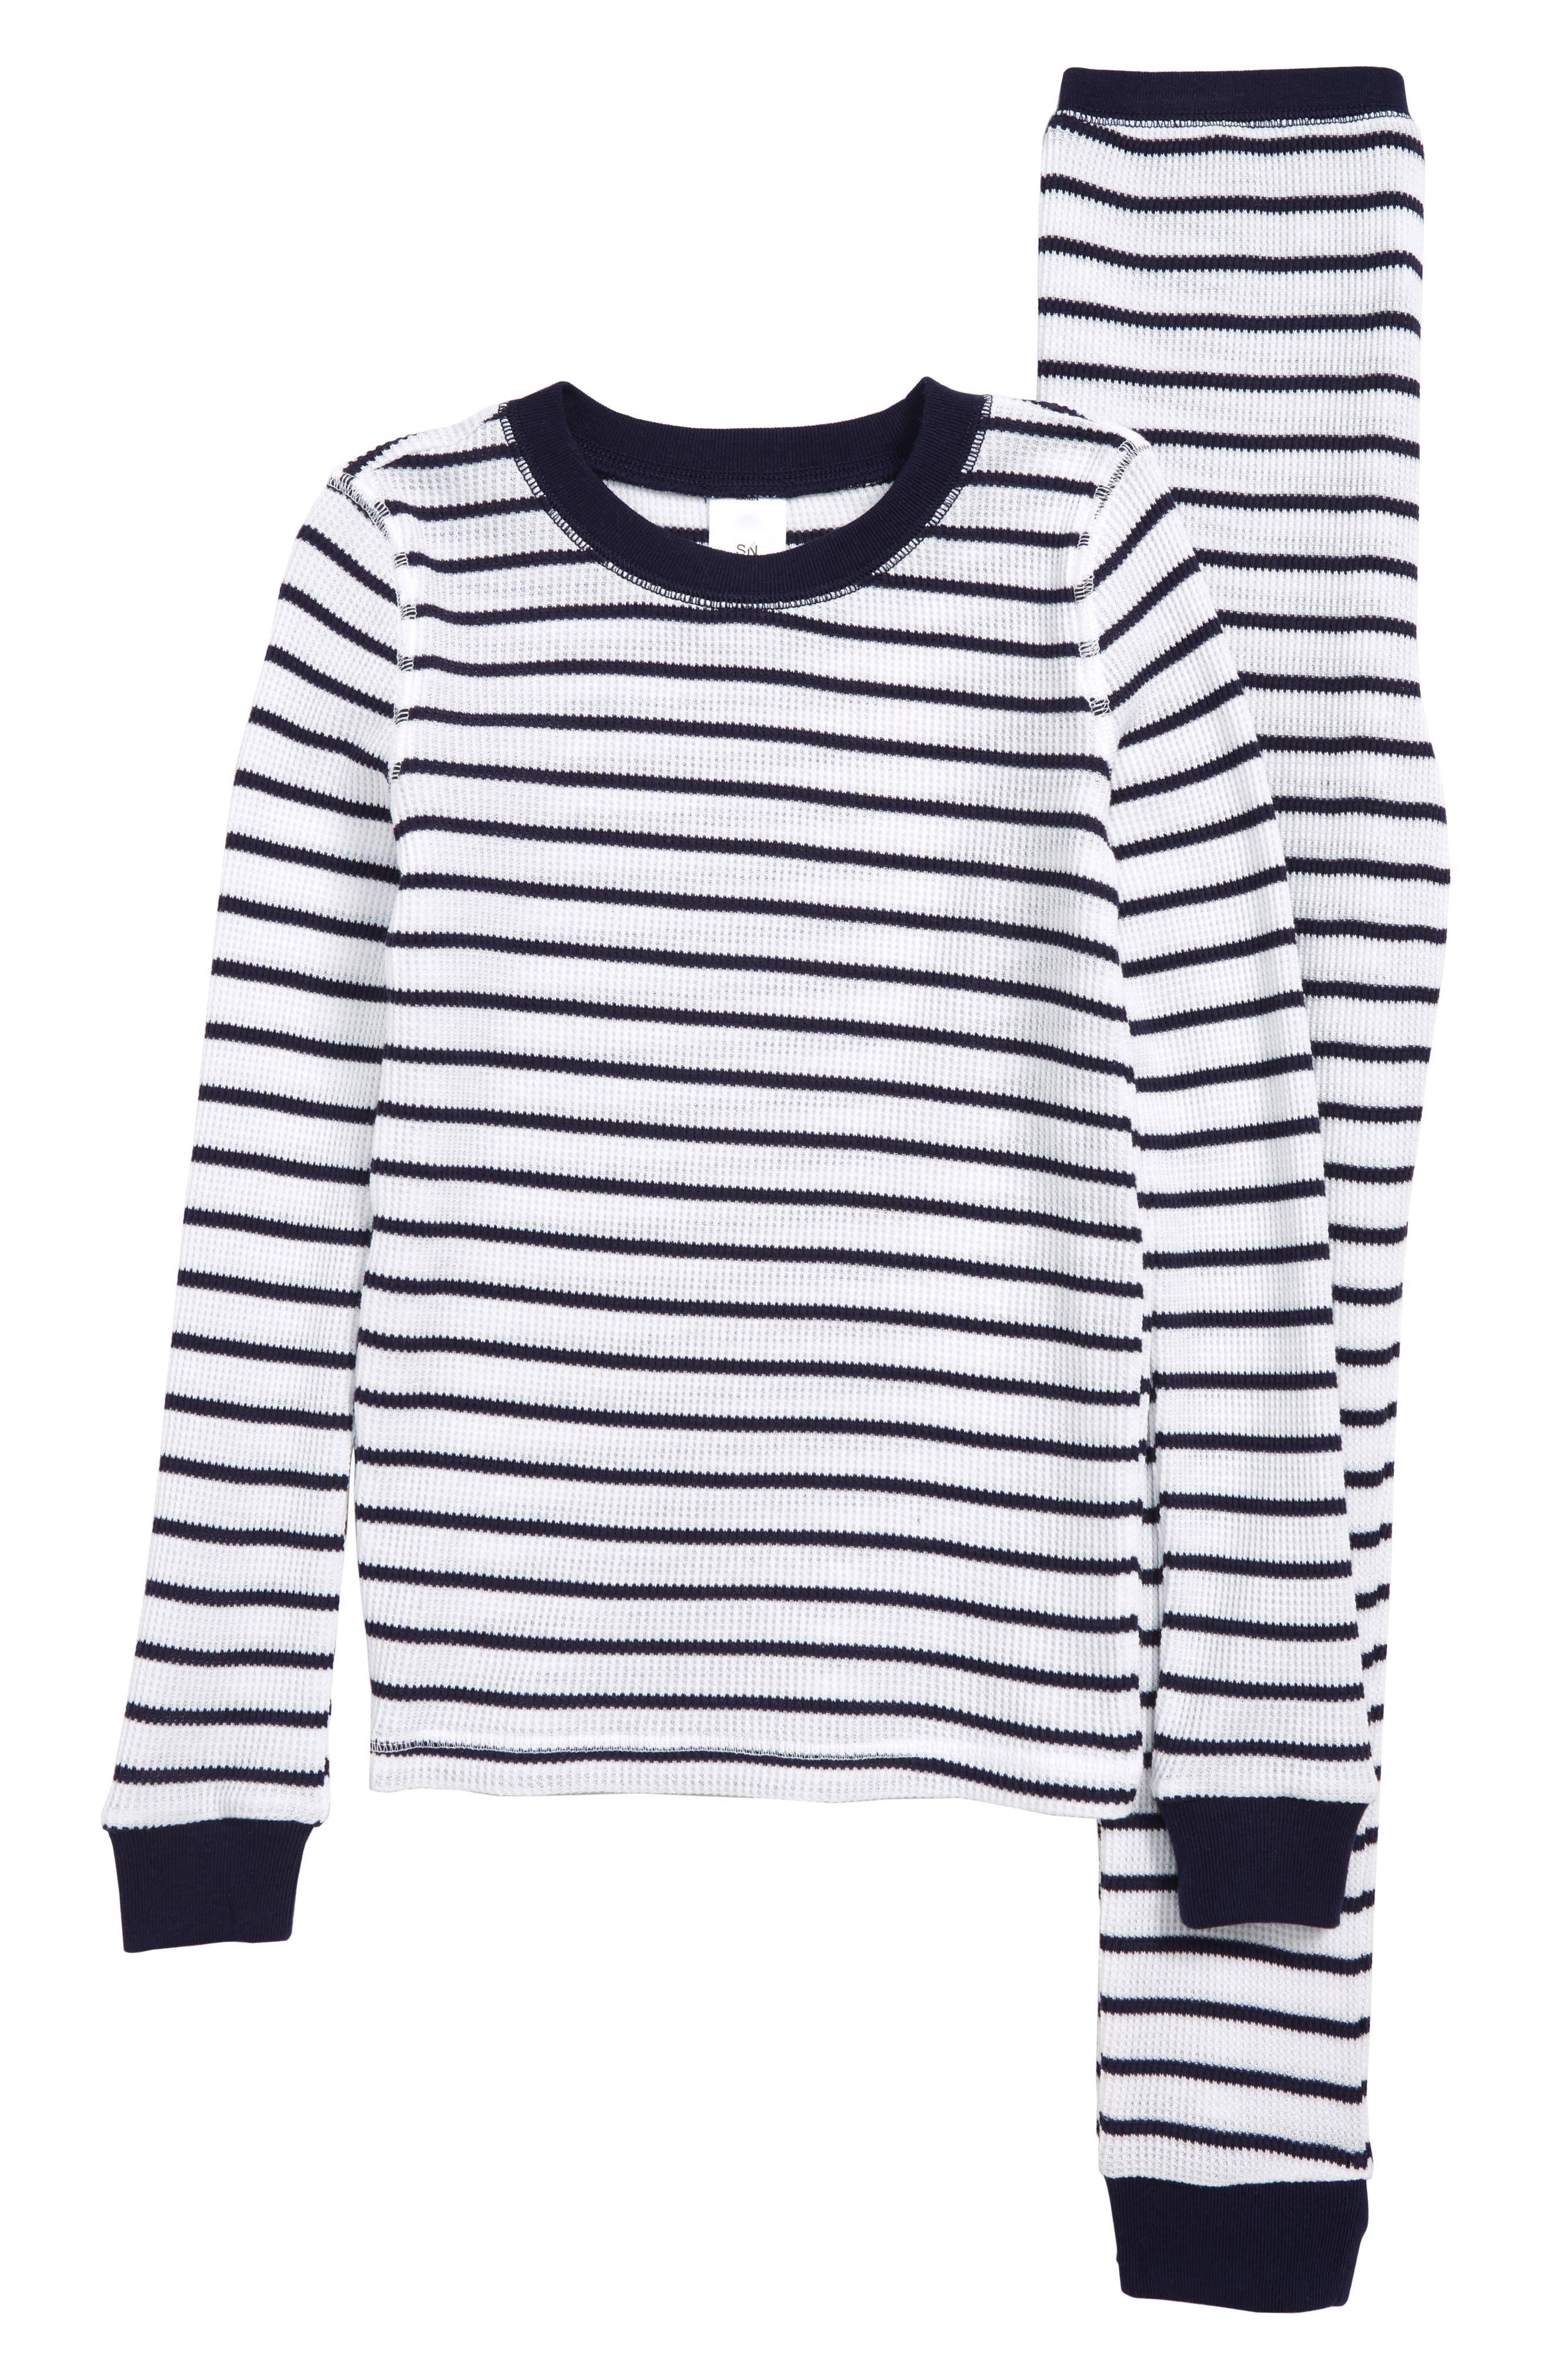 Toddler Girls Something Navy Thermal Fitted TwoPiece Pajamas Size 3T  White